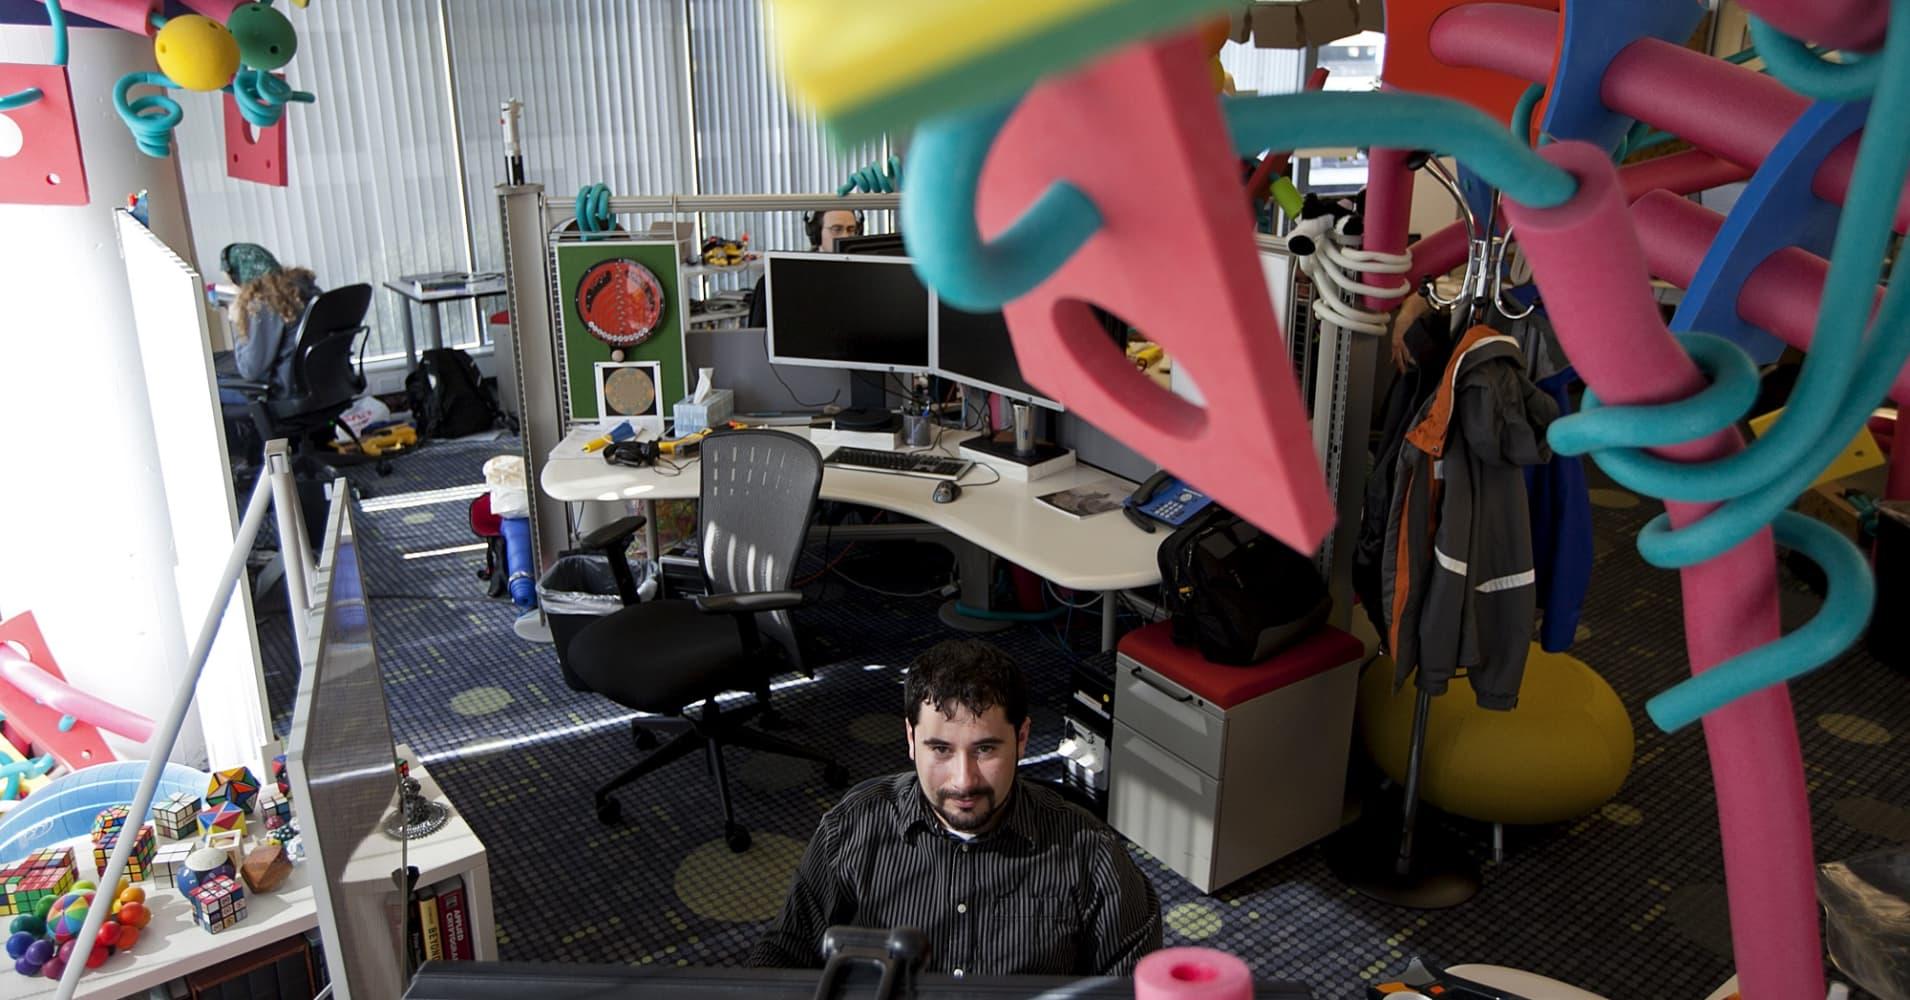 Vitaliy Lvin is a software engineer at Google